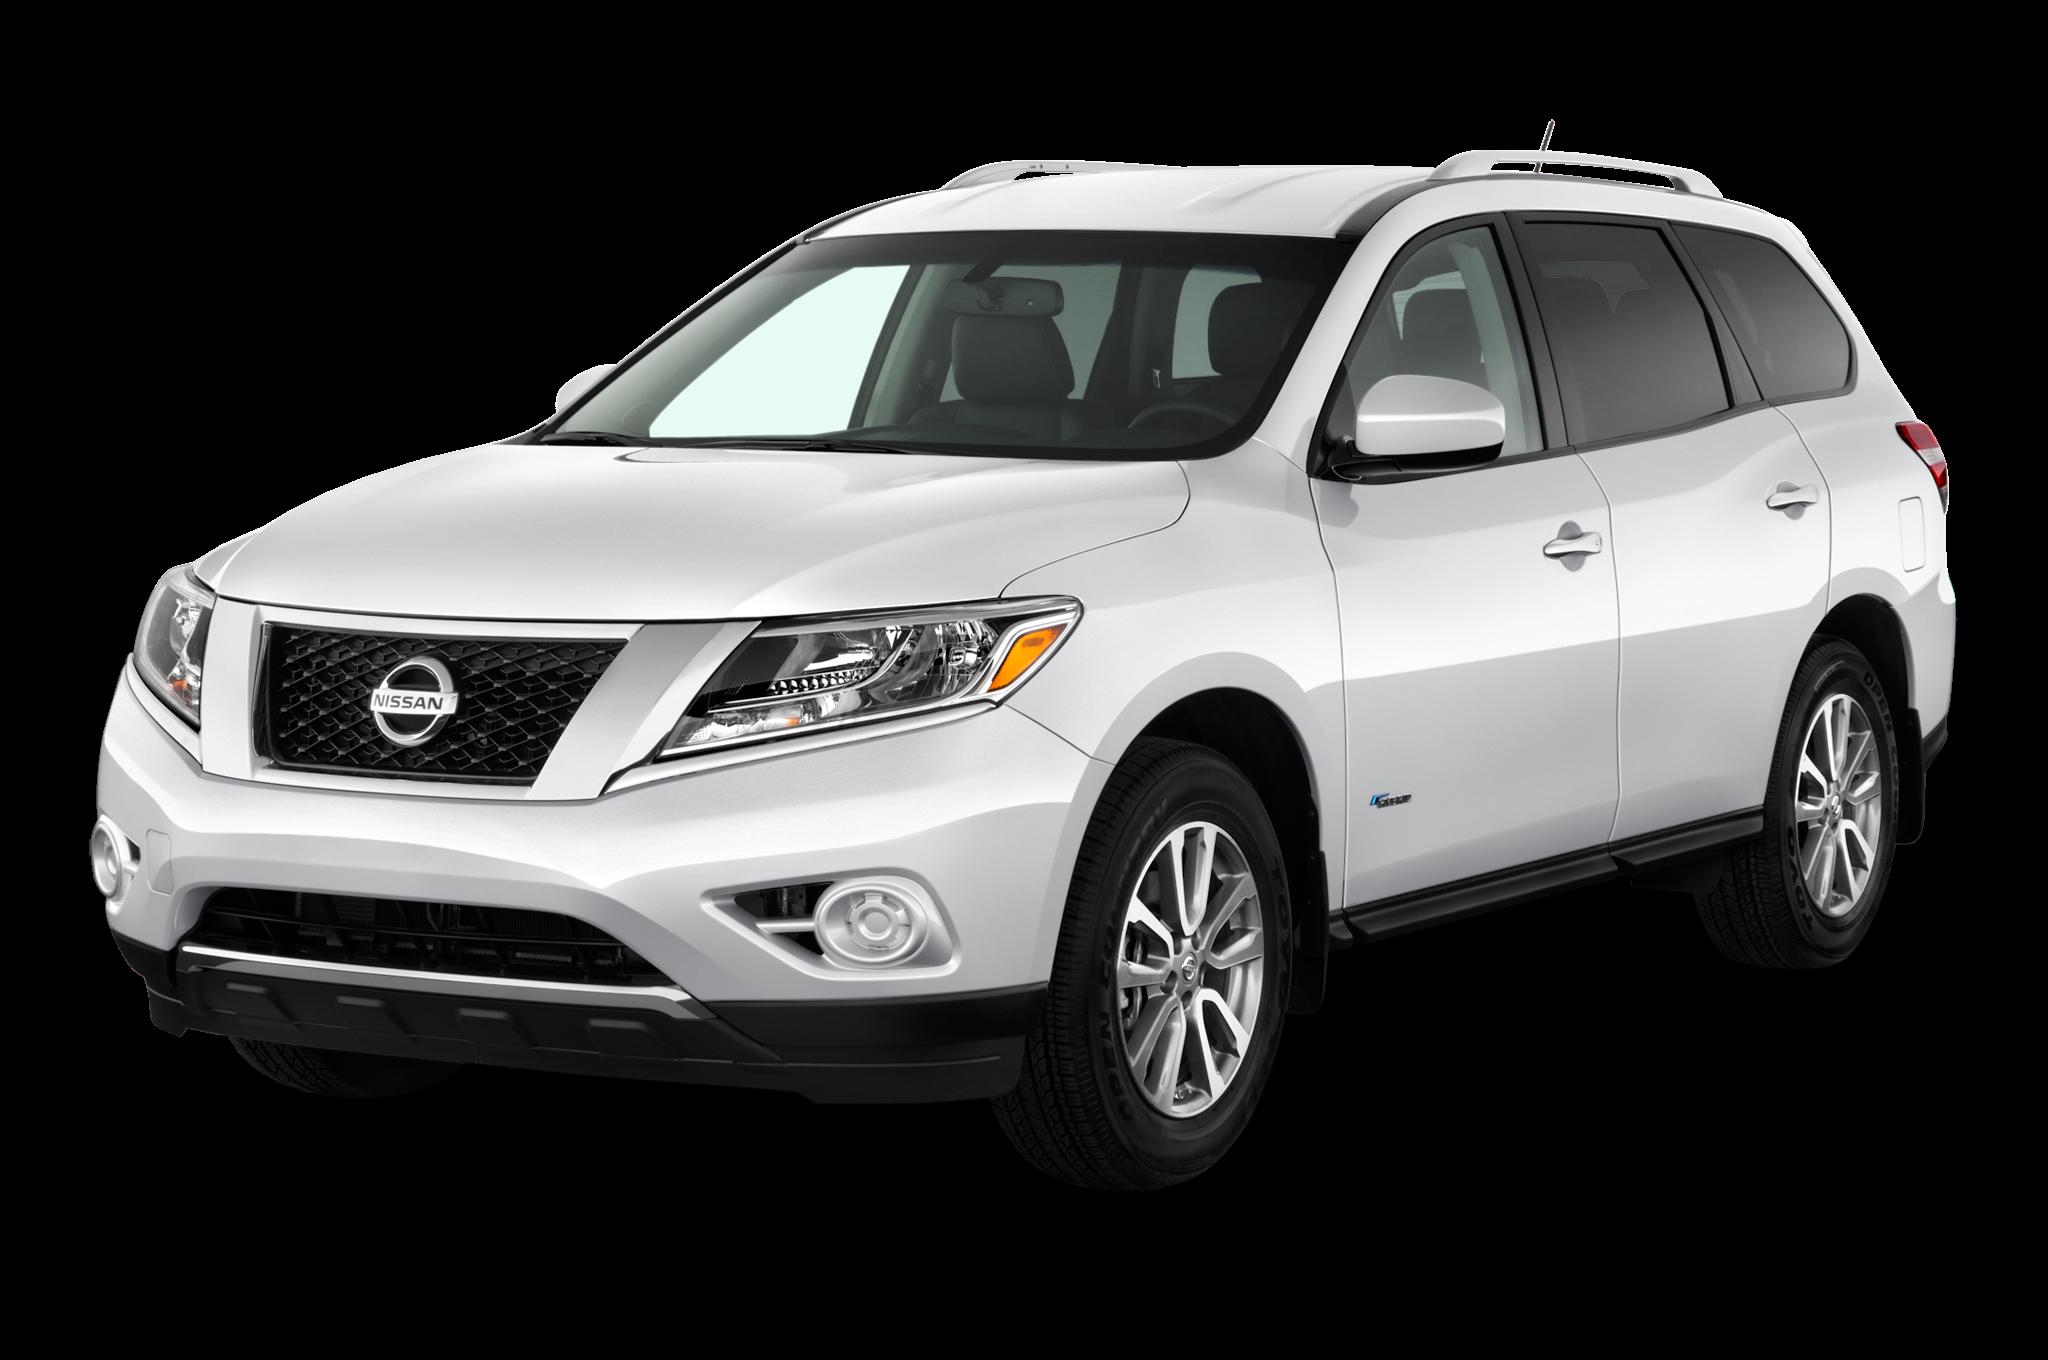 Nissan PATHFINDER HYBRID SL 4WD Hybrid 2014 International Price